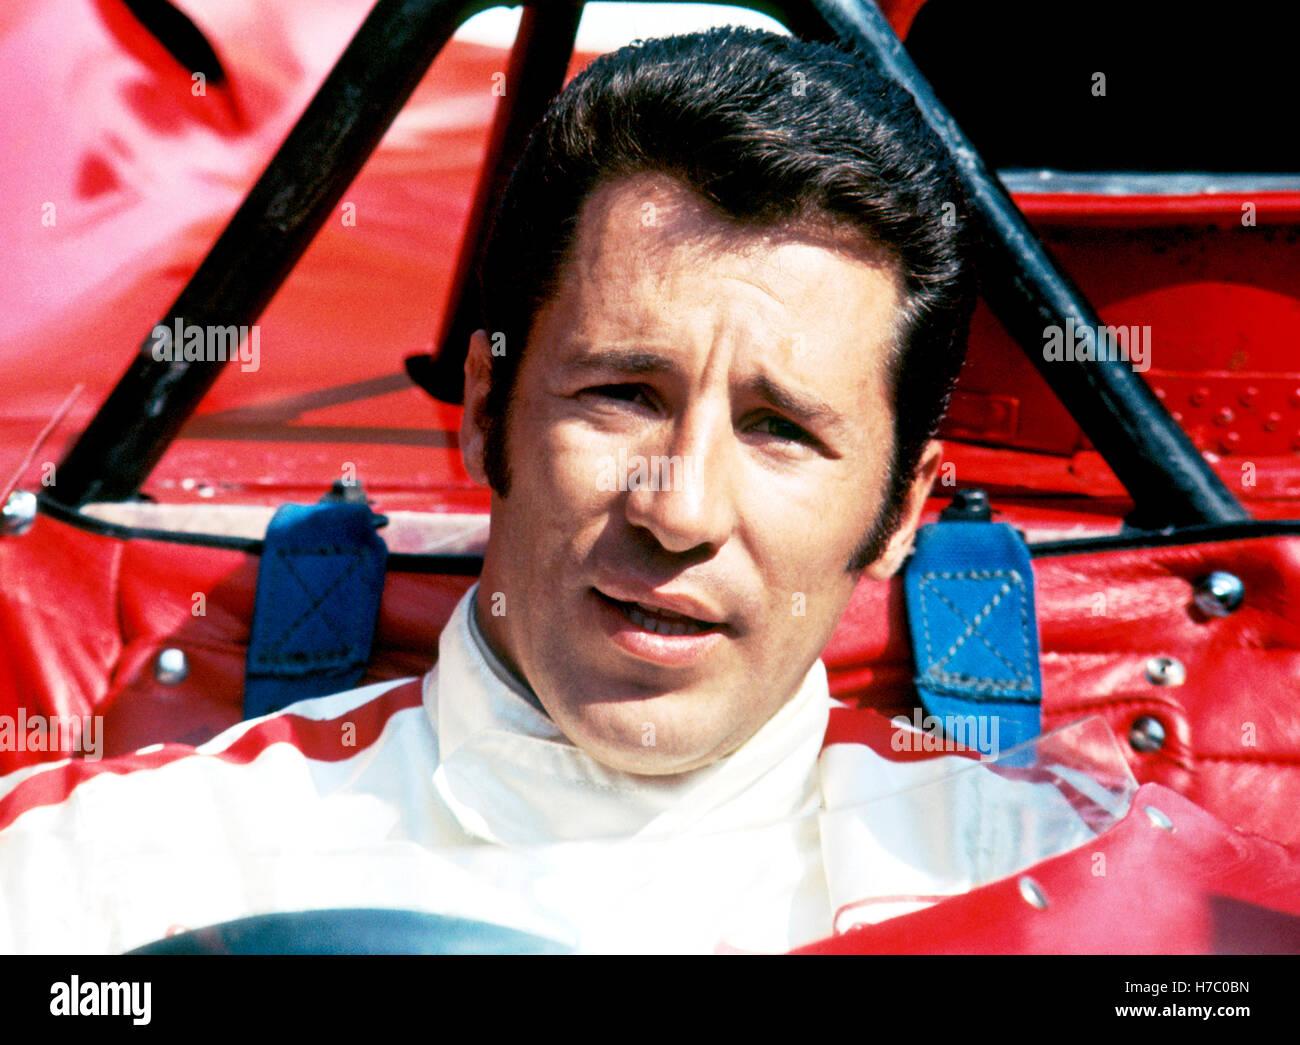 Mario Andretti 1969 Ferrari 312P - Stock Image